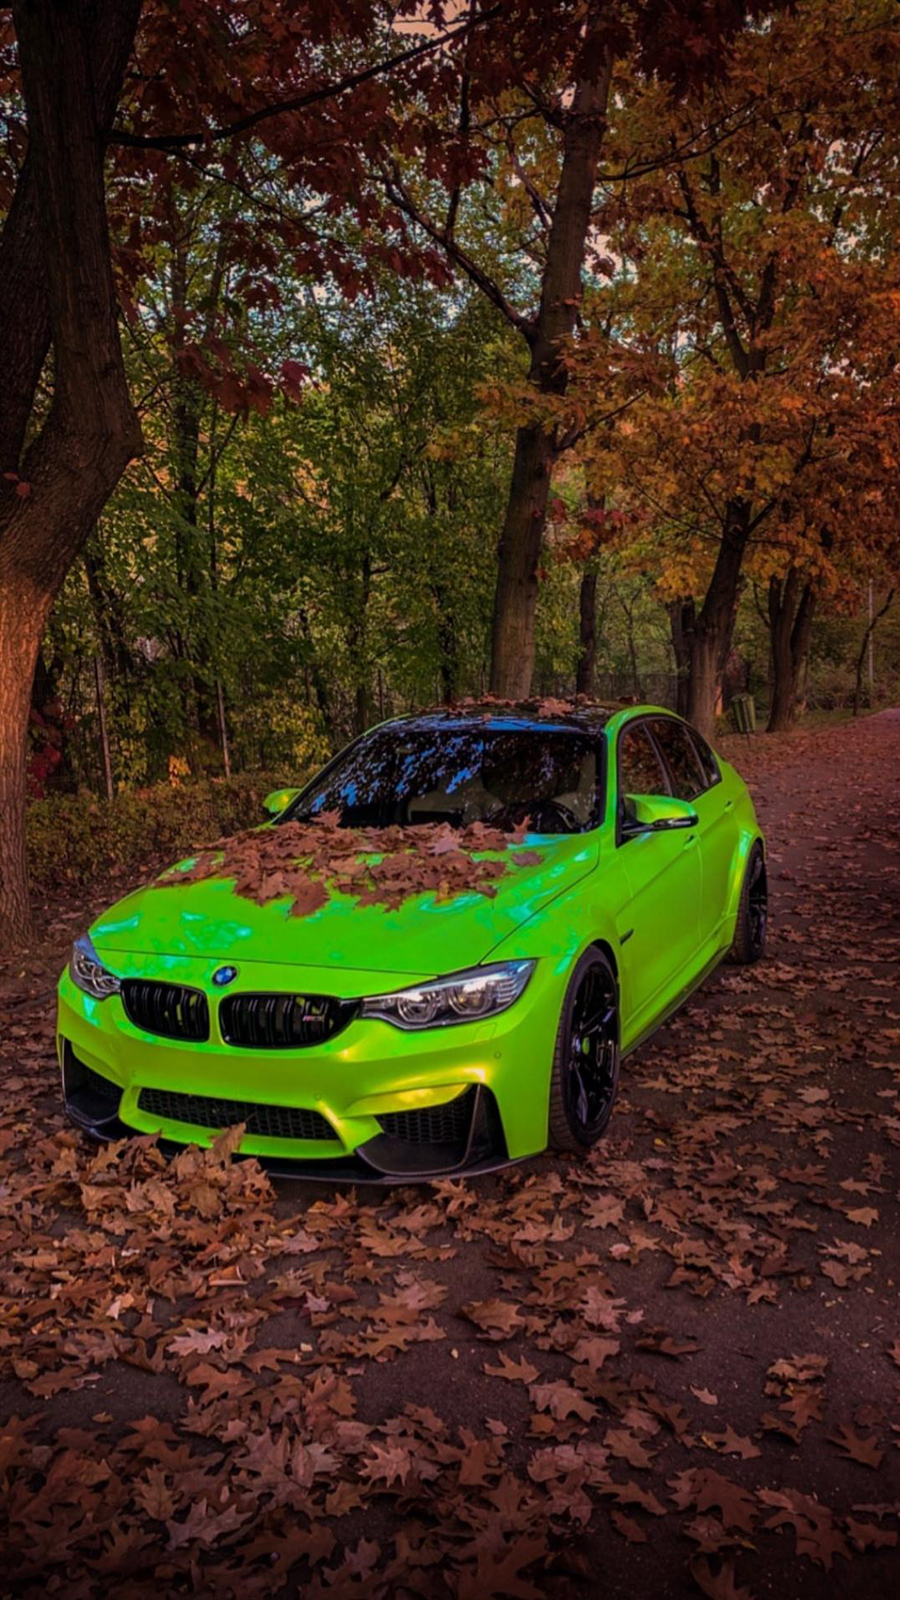 BMW Wallpaper – Most Popular Car Wallpapers Free Download